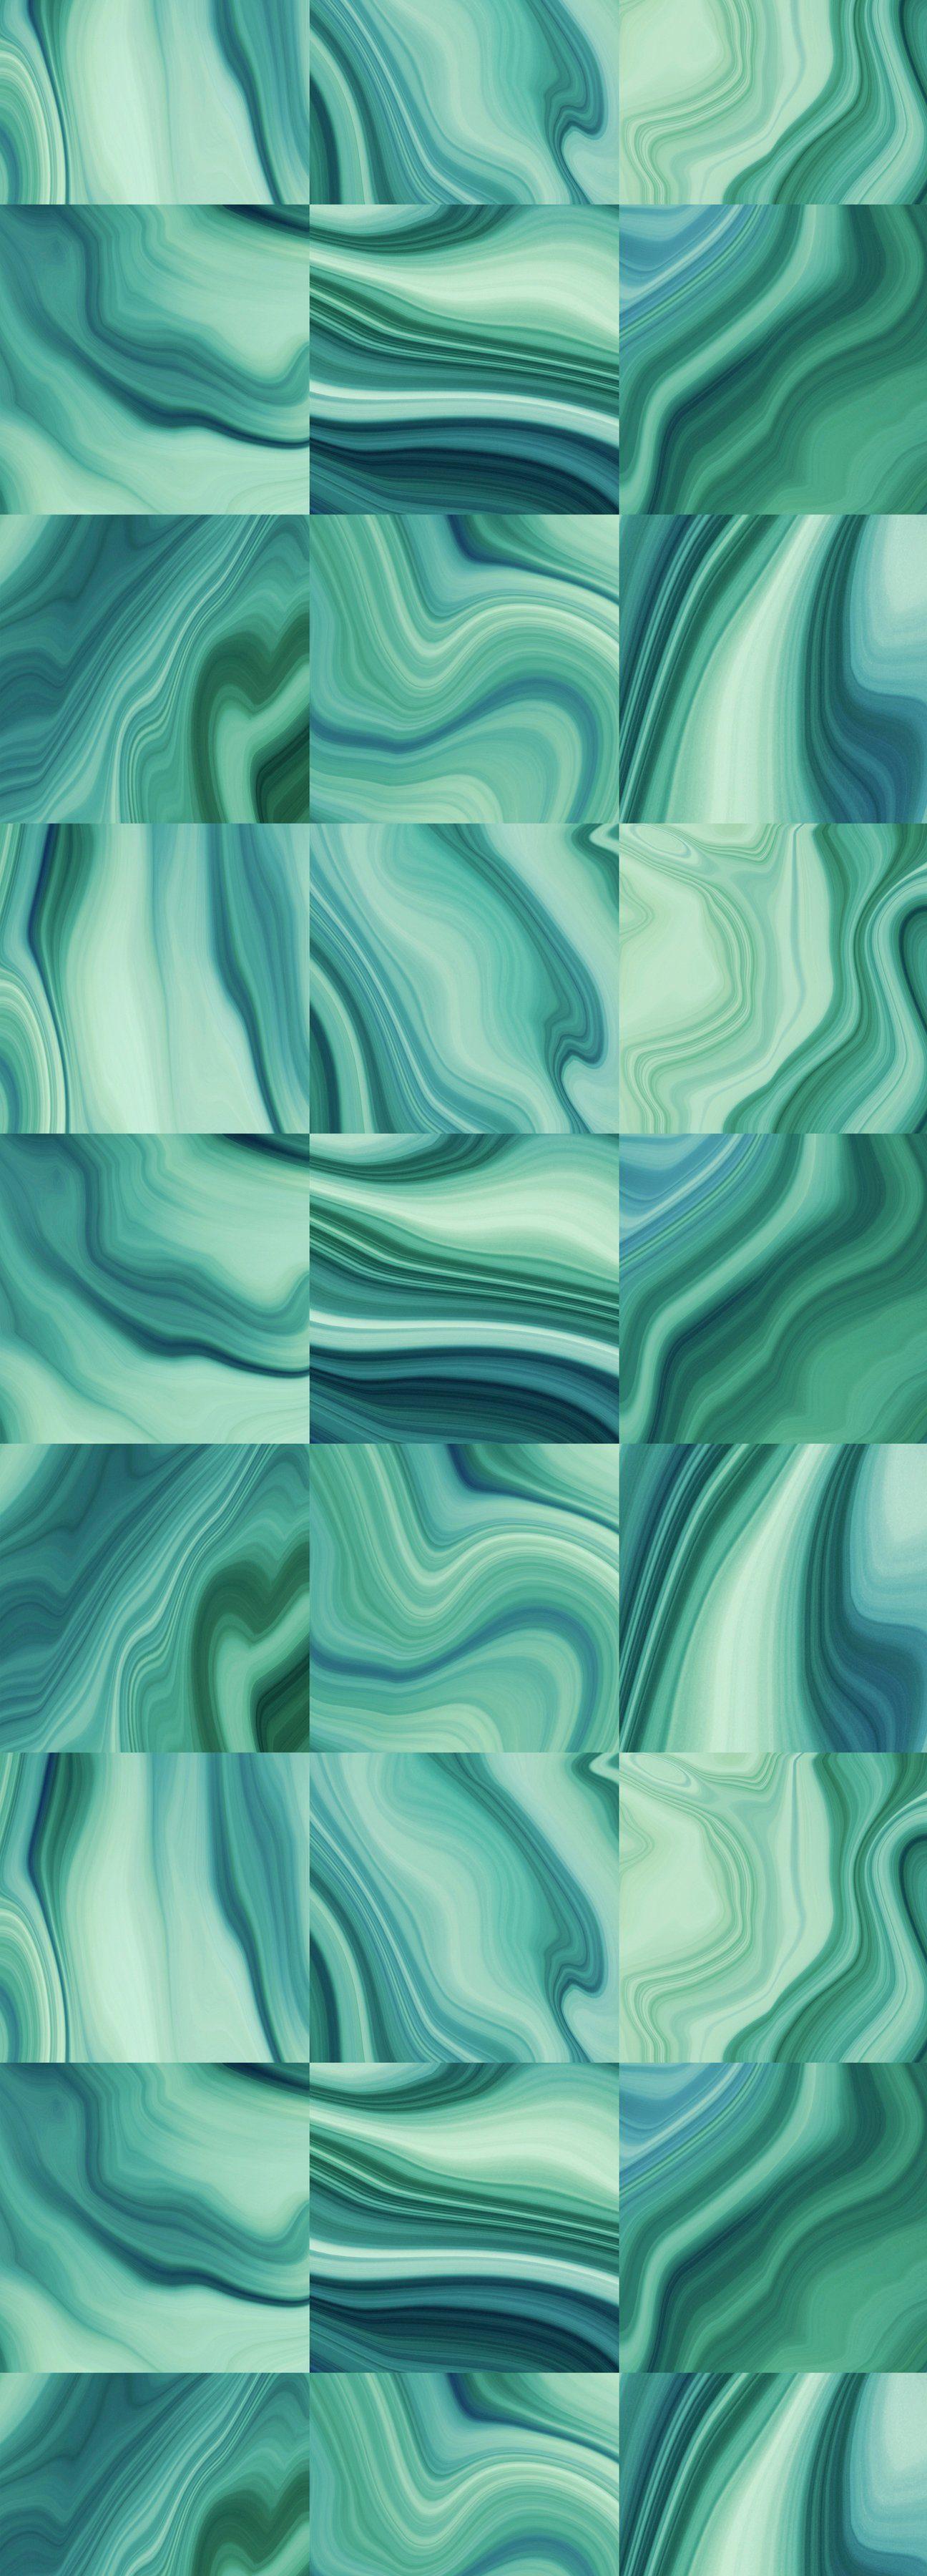 QUEENCE Vinyltapete »Noly«, 90 x 250 cm, selbstklebend